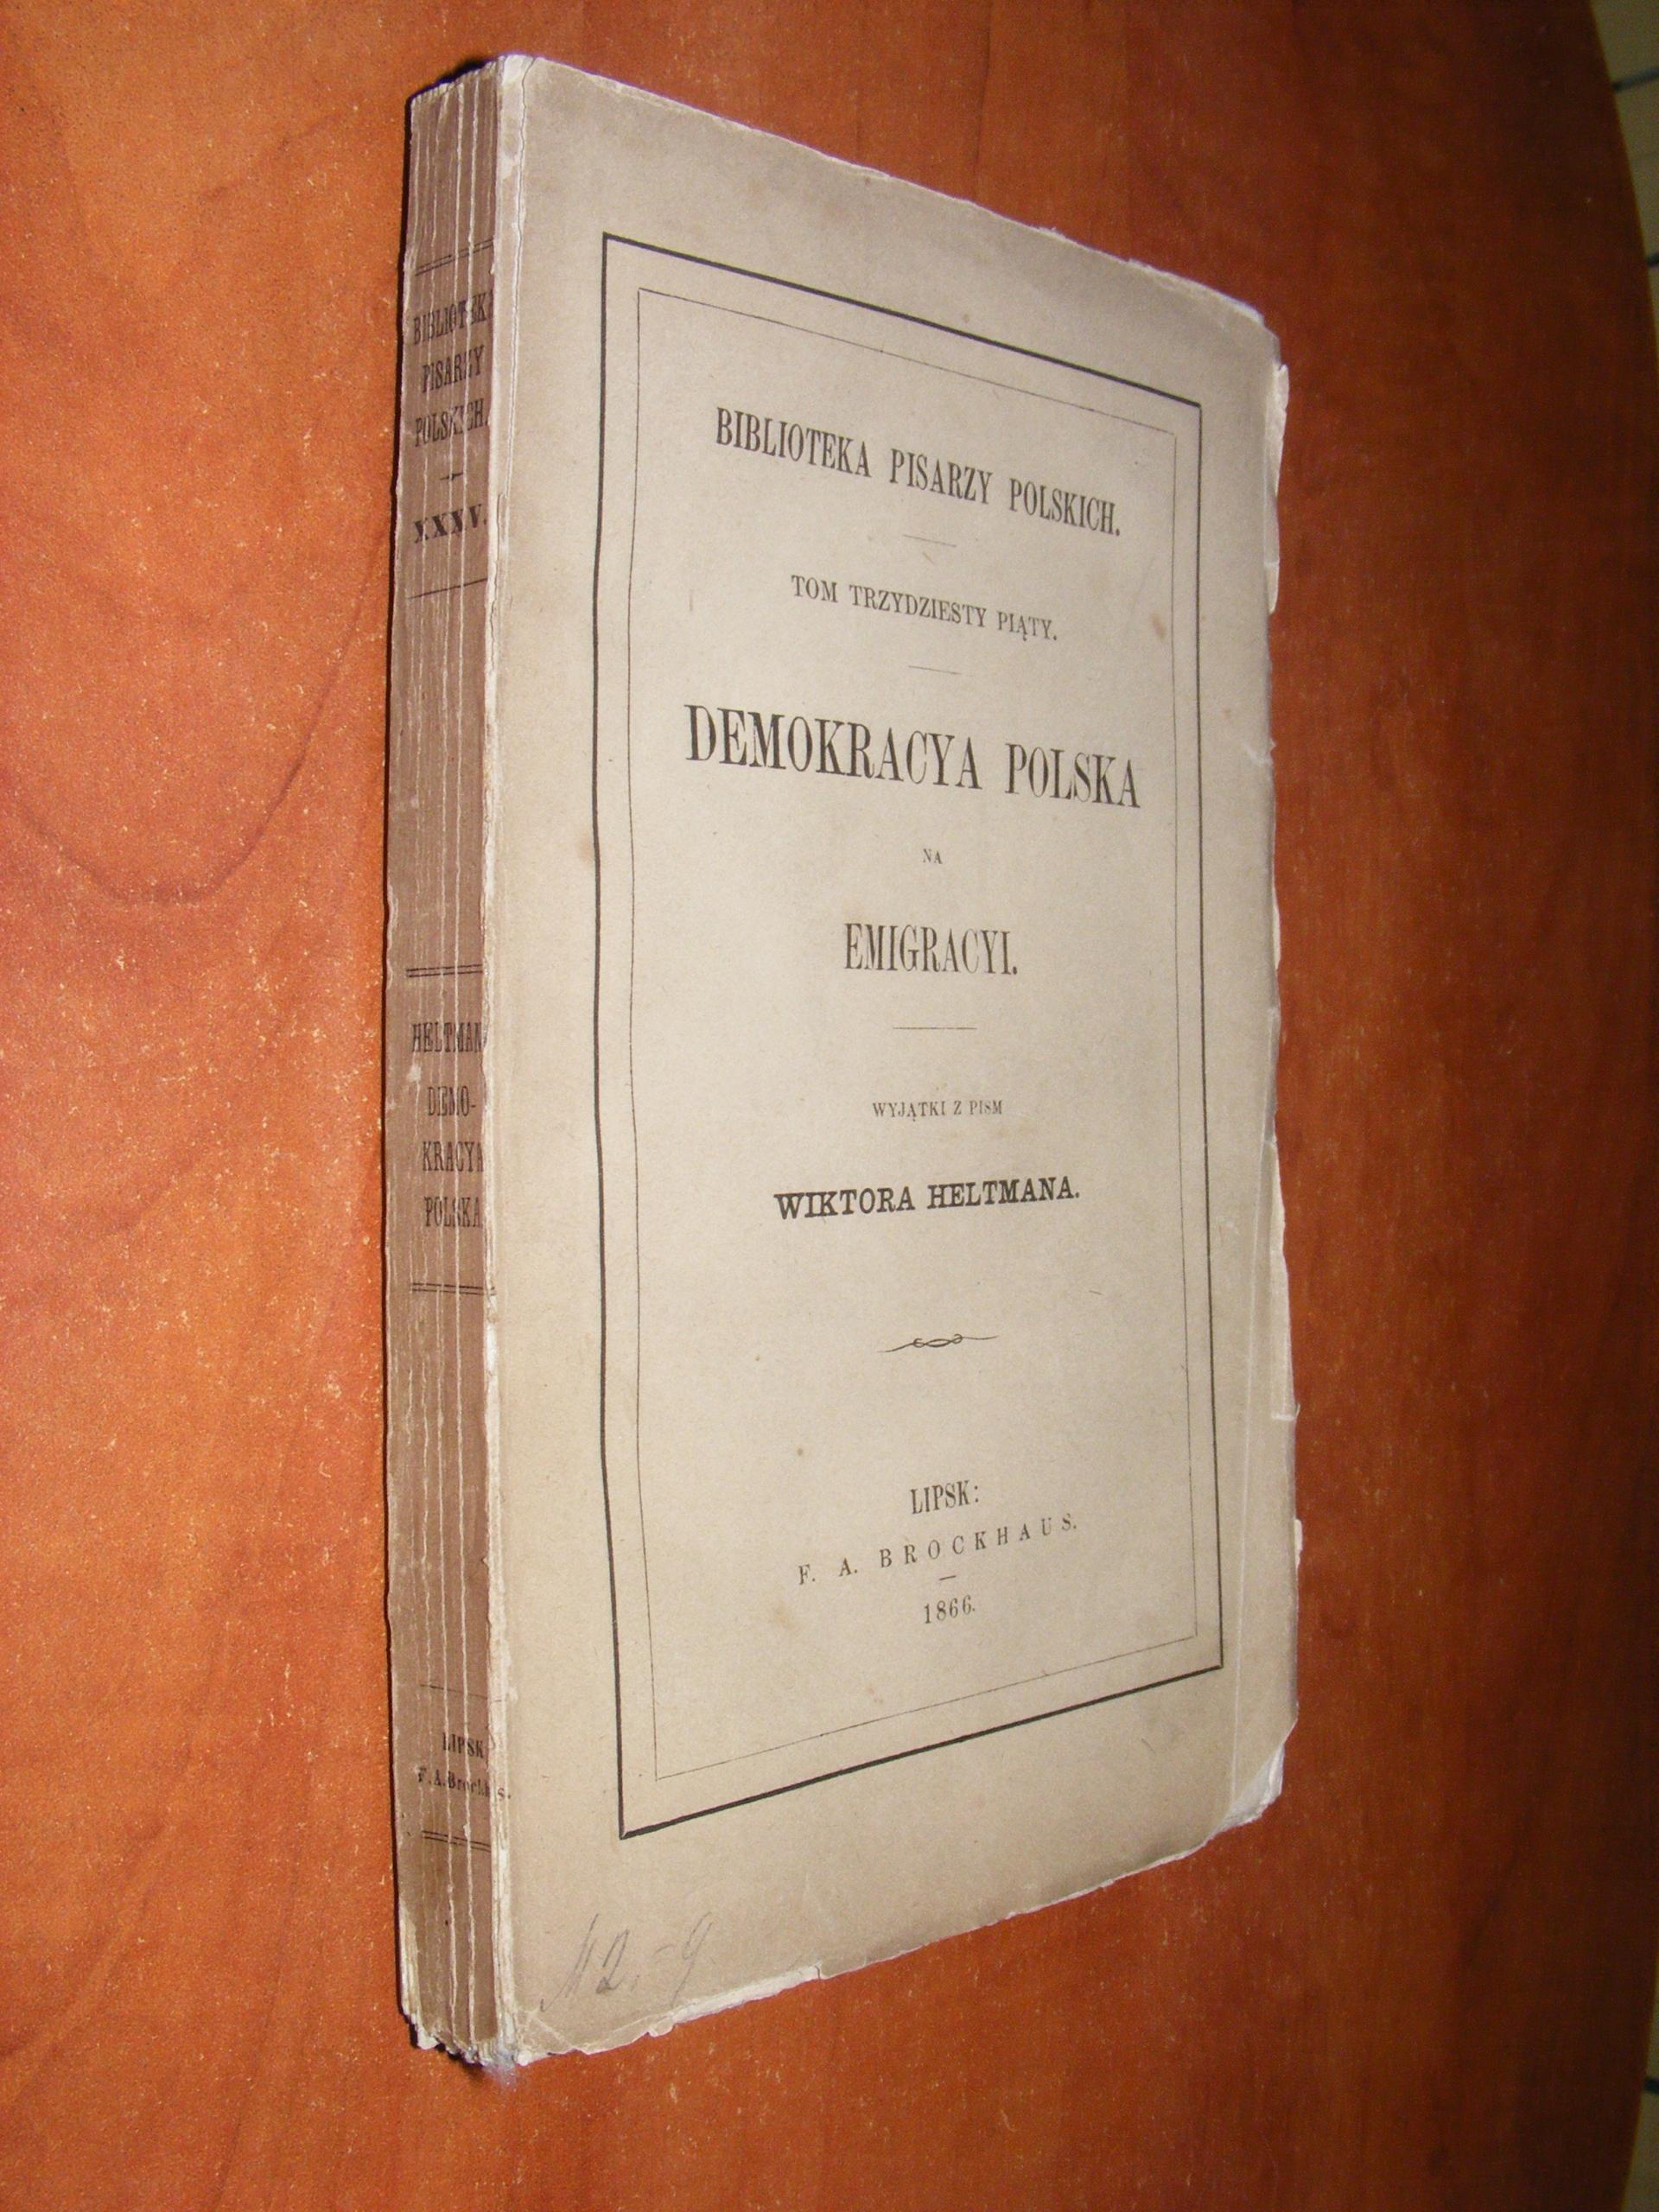 HELTMAN - DEMOKRACYA POLSKA NA EMIGRACJI 1866